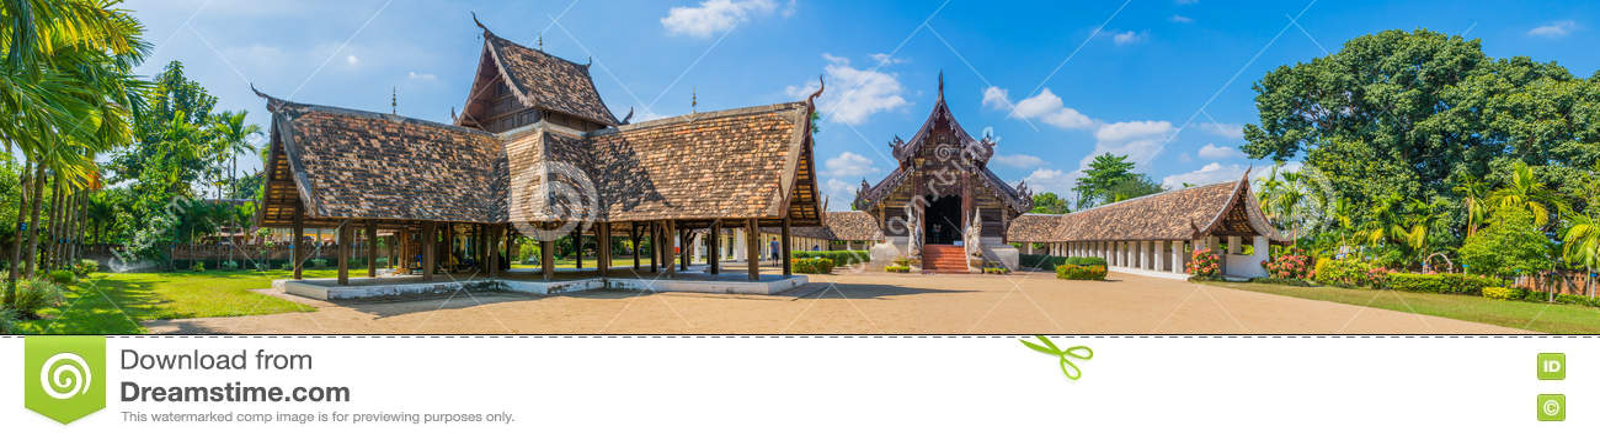 Panorama sparato di Wat Ton Kain, in Chiang Mai Thailand